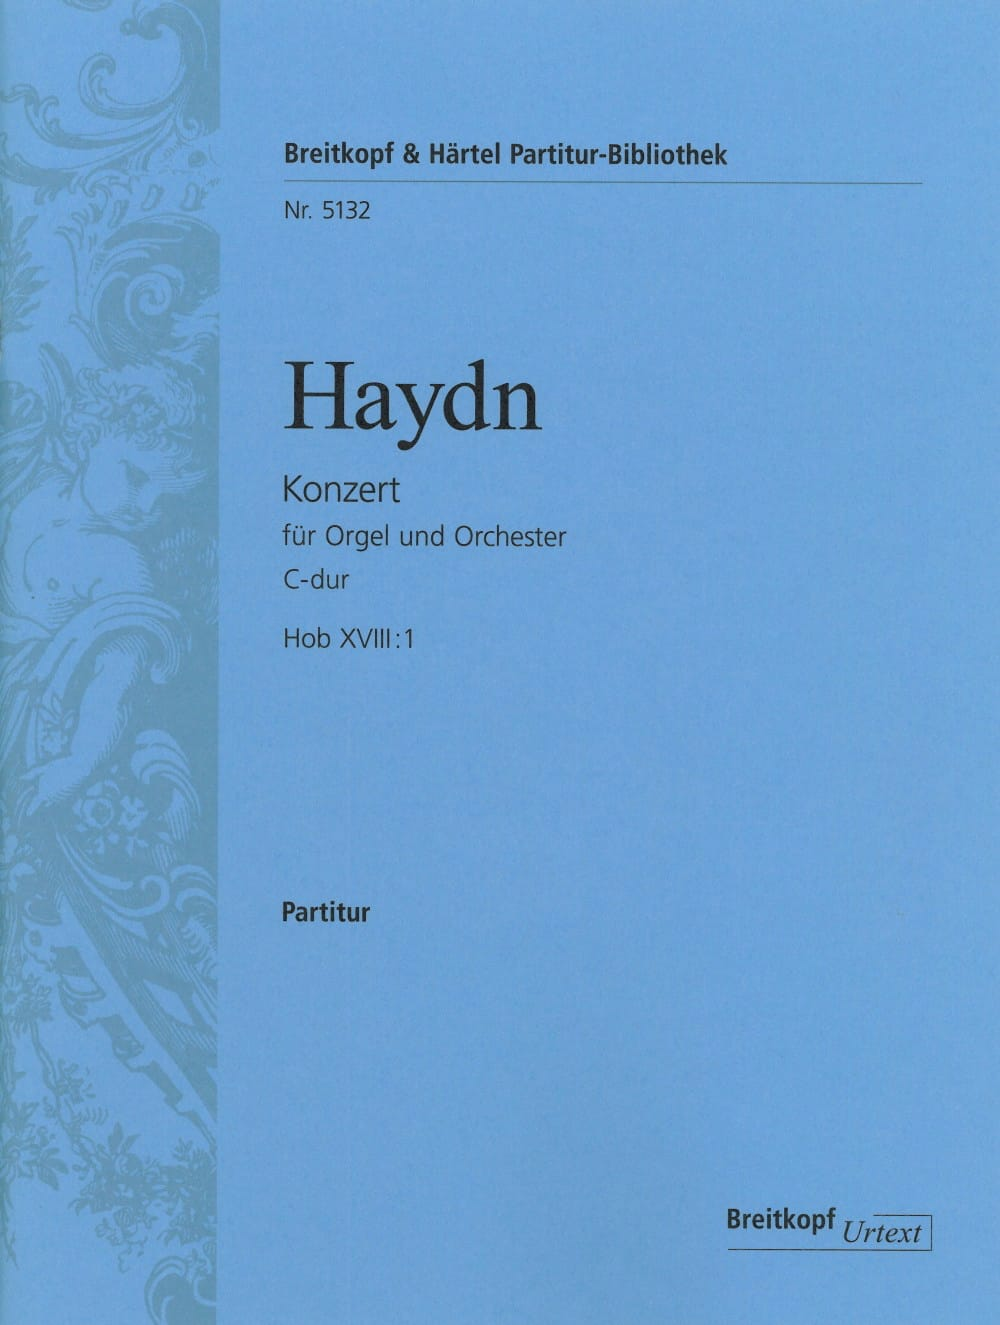 Orgel-Konzert C-Dur Hob 18: 1 - Partitur - HAYDN - laflutedepan.com